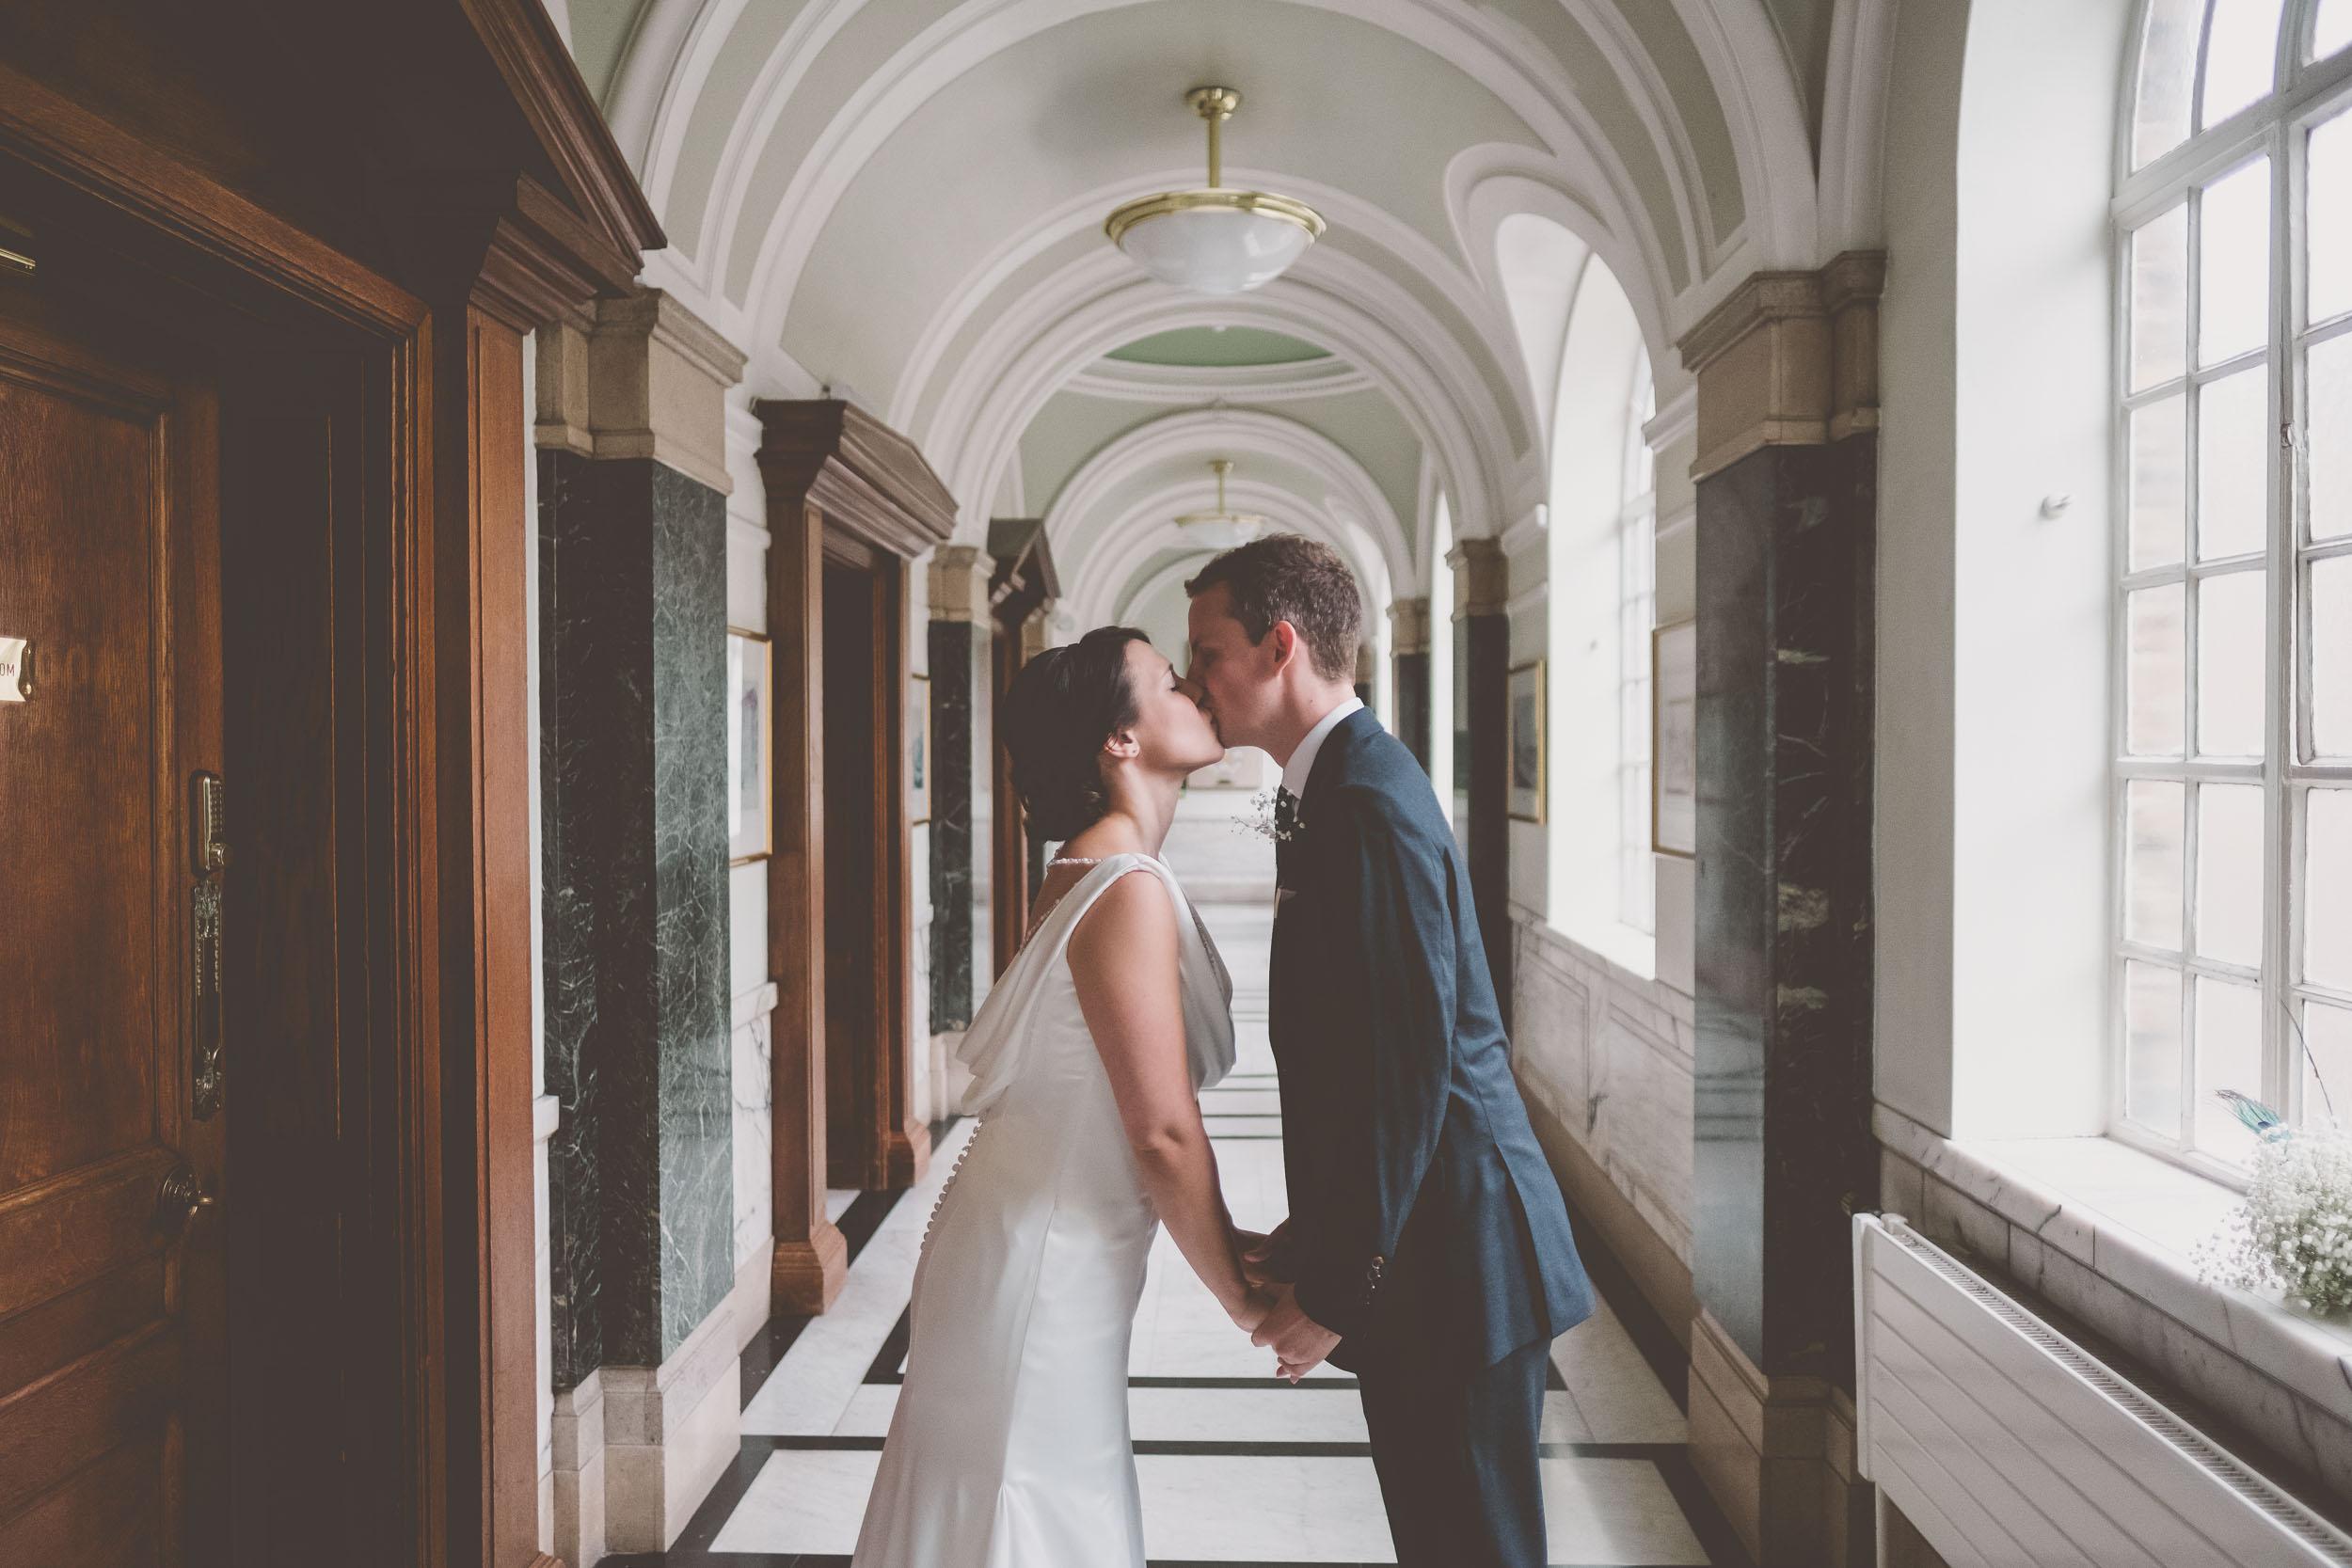 islington-town-hall-4th-floor-studios-wedding132.jpg